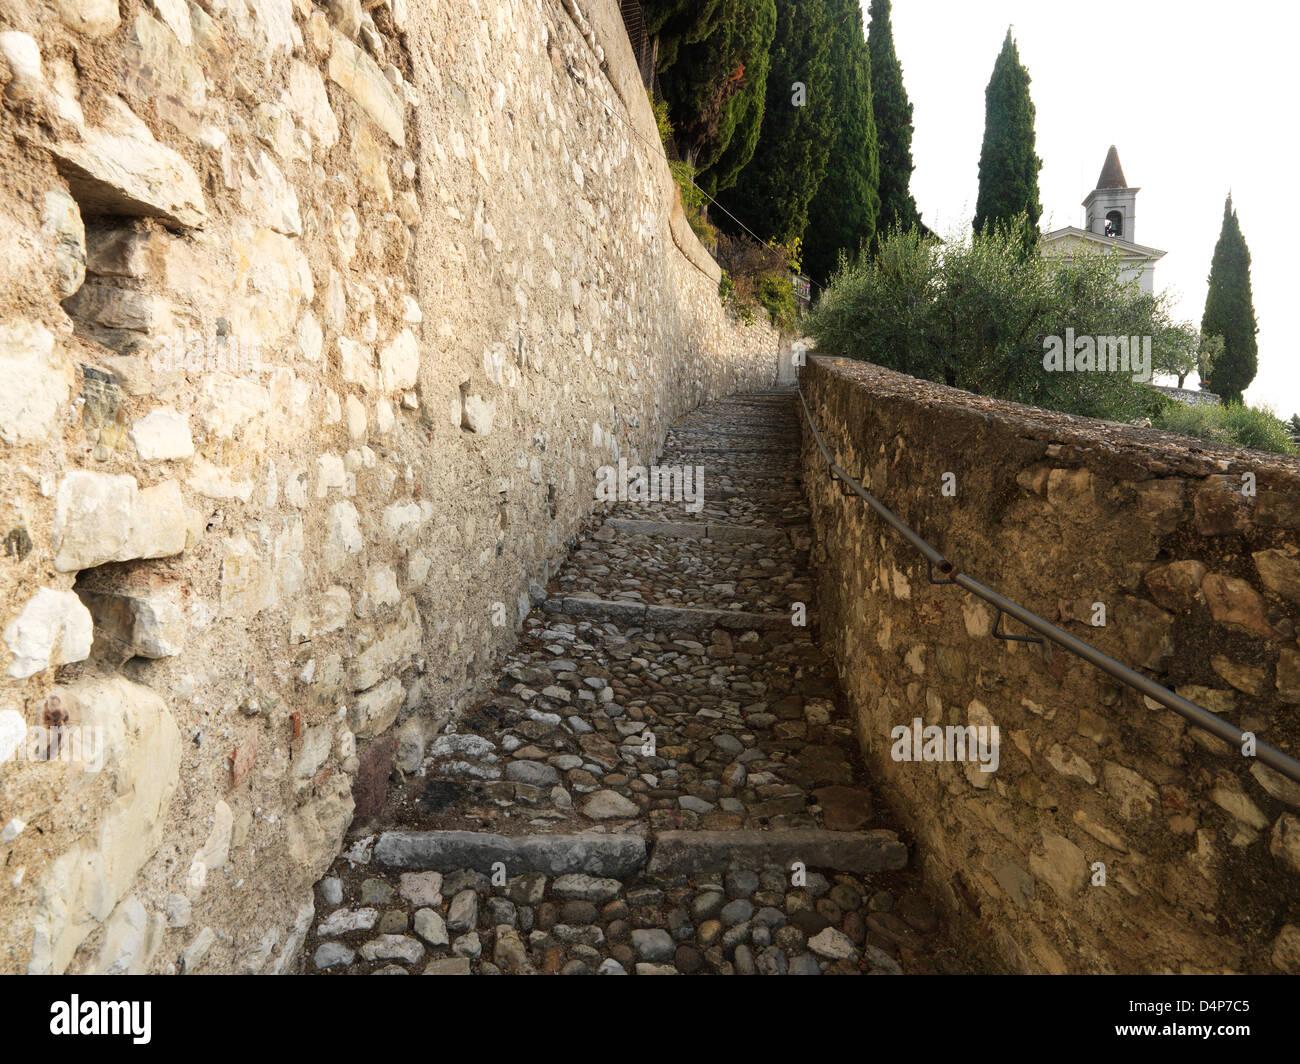 Image result for san tommaso gargnano images